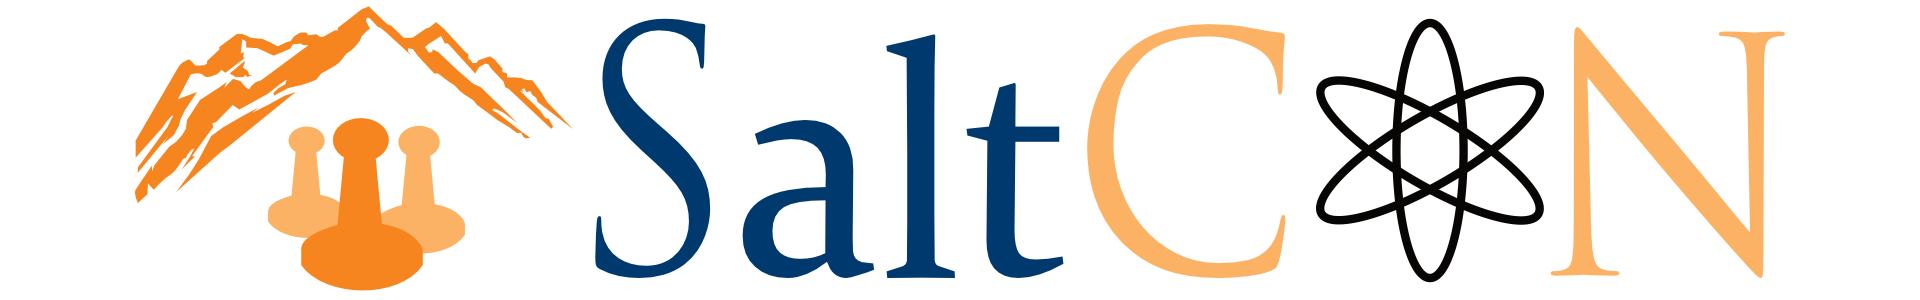 saltcon